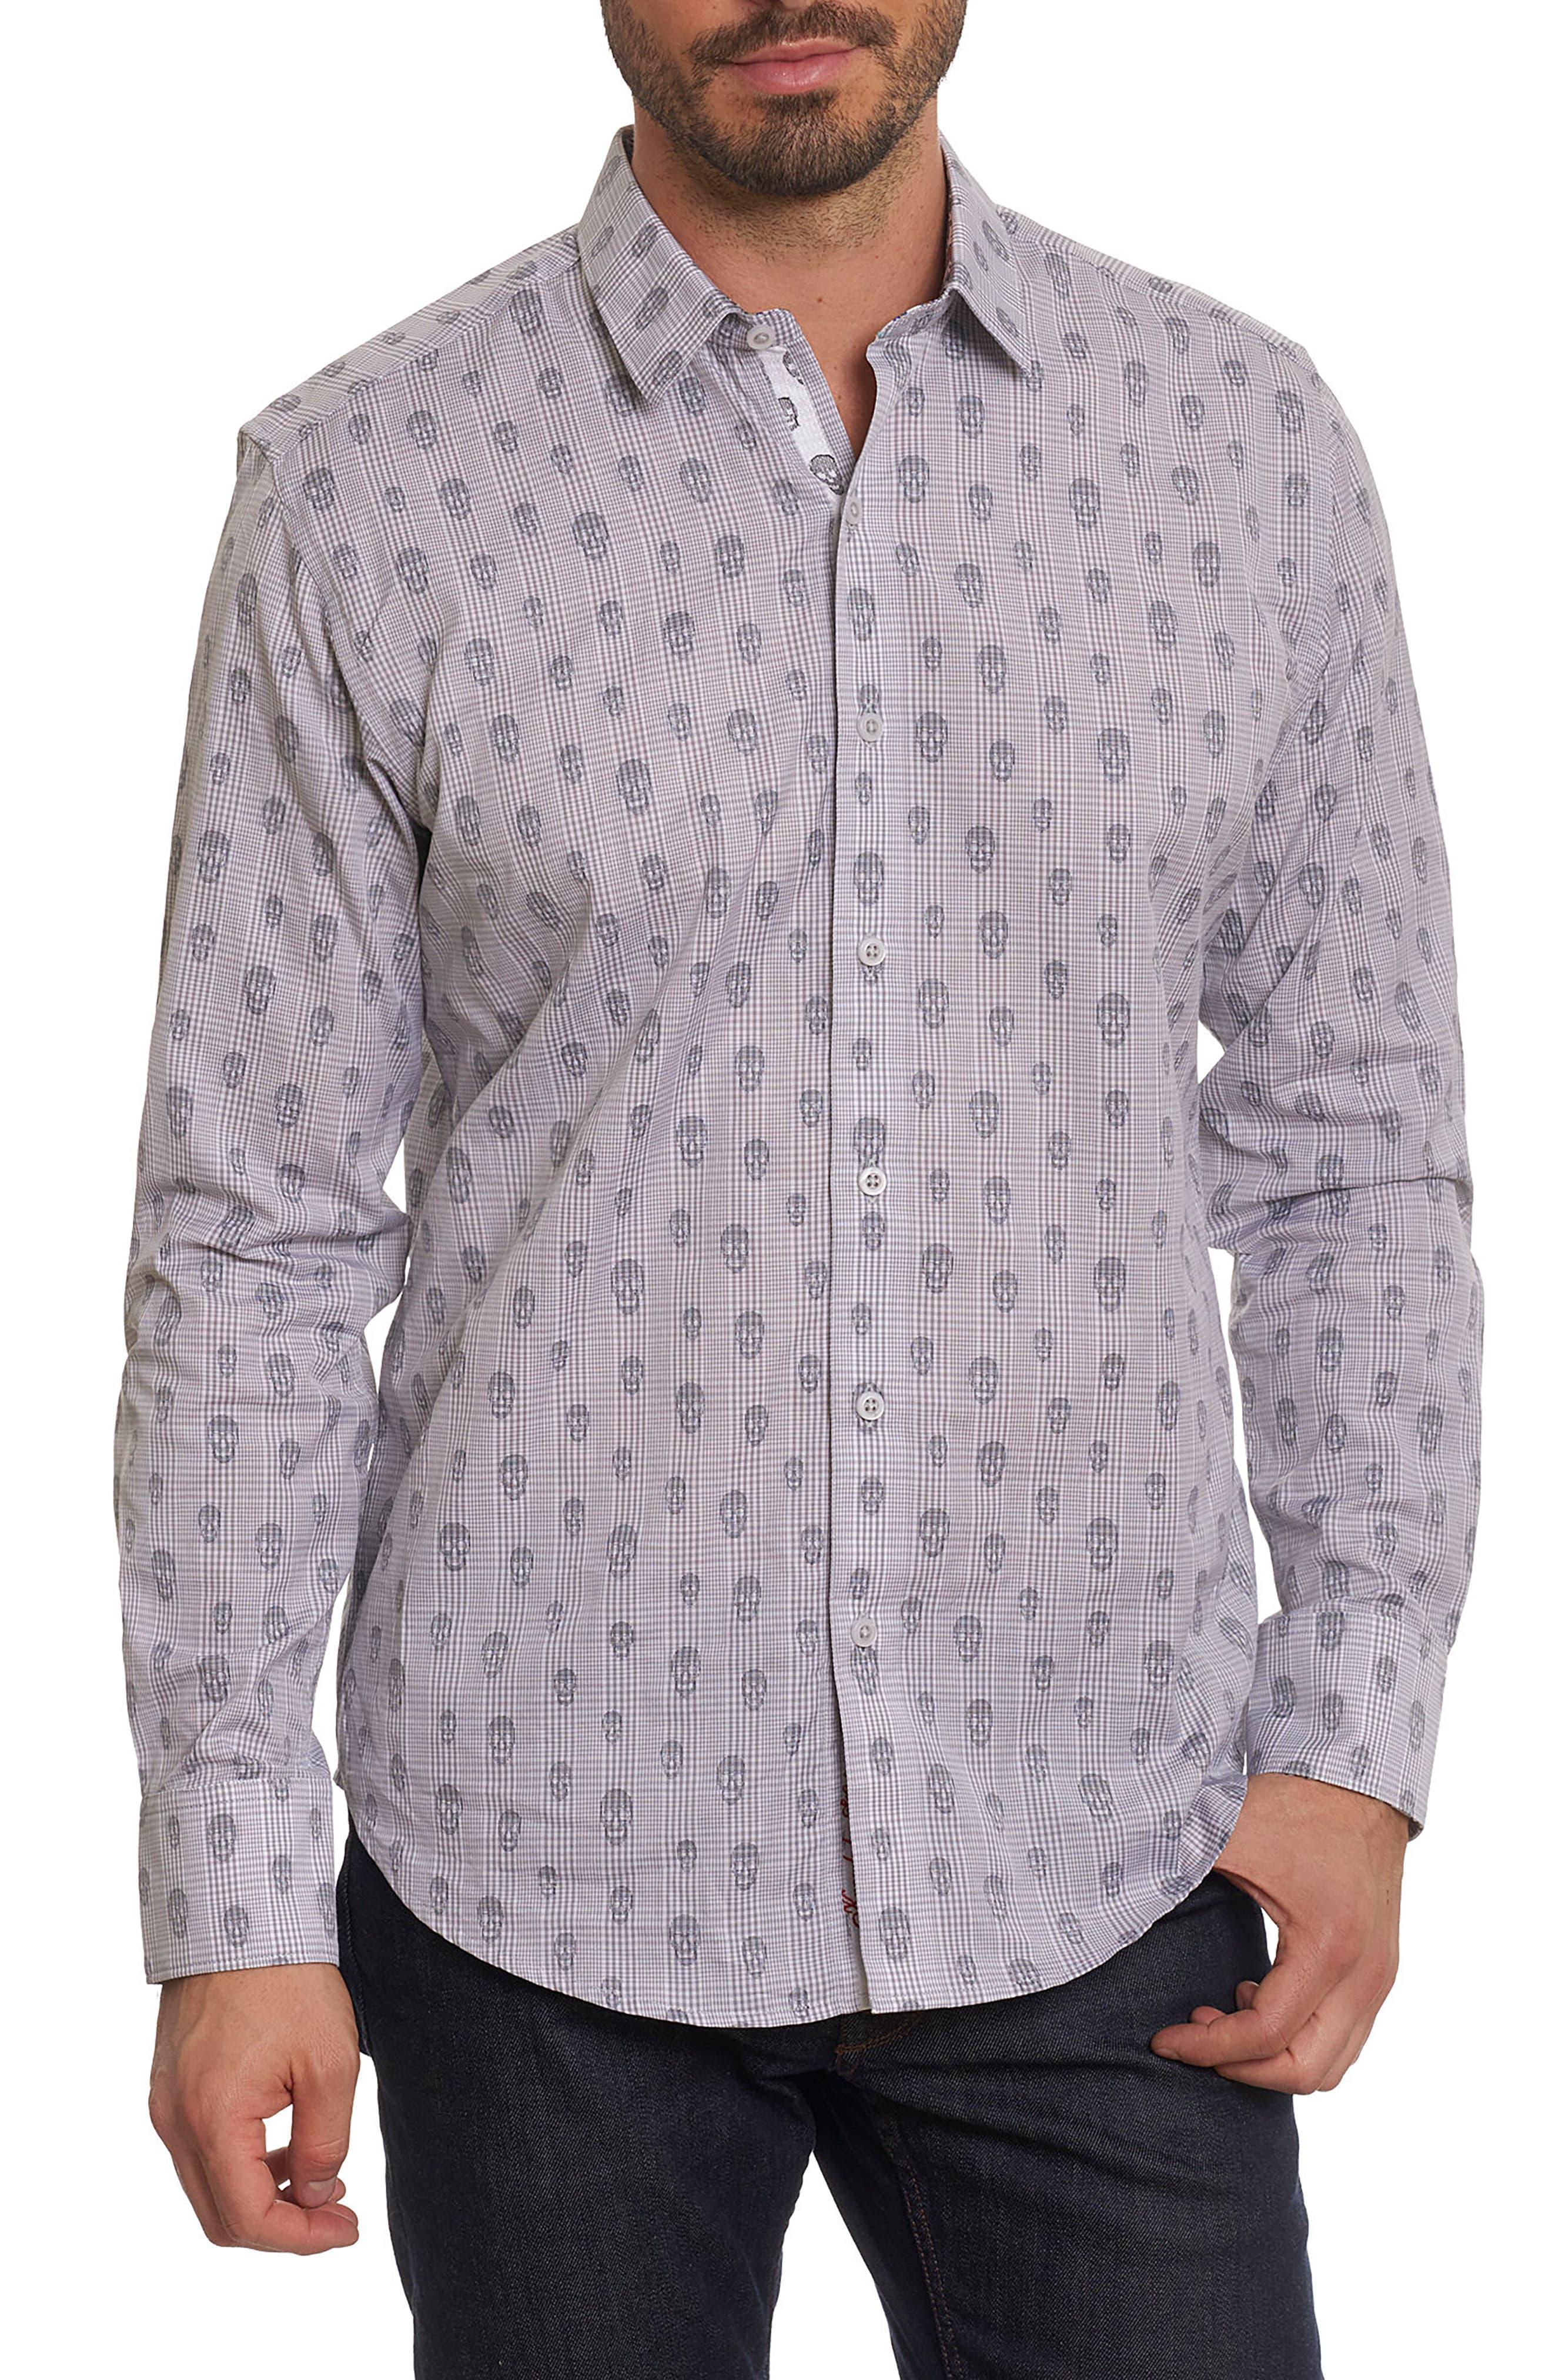 Kinderhook Classic Fit Skull Check Sport Shirt,                         Main,                         color, Grey